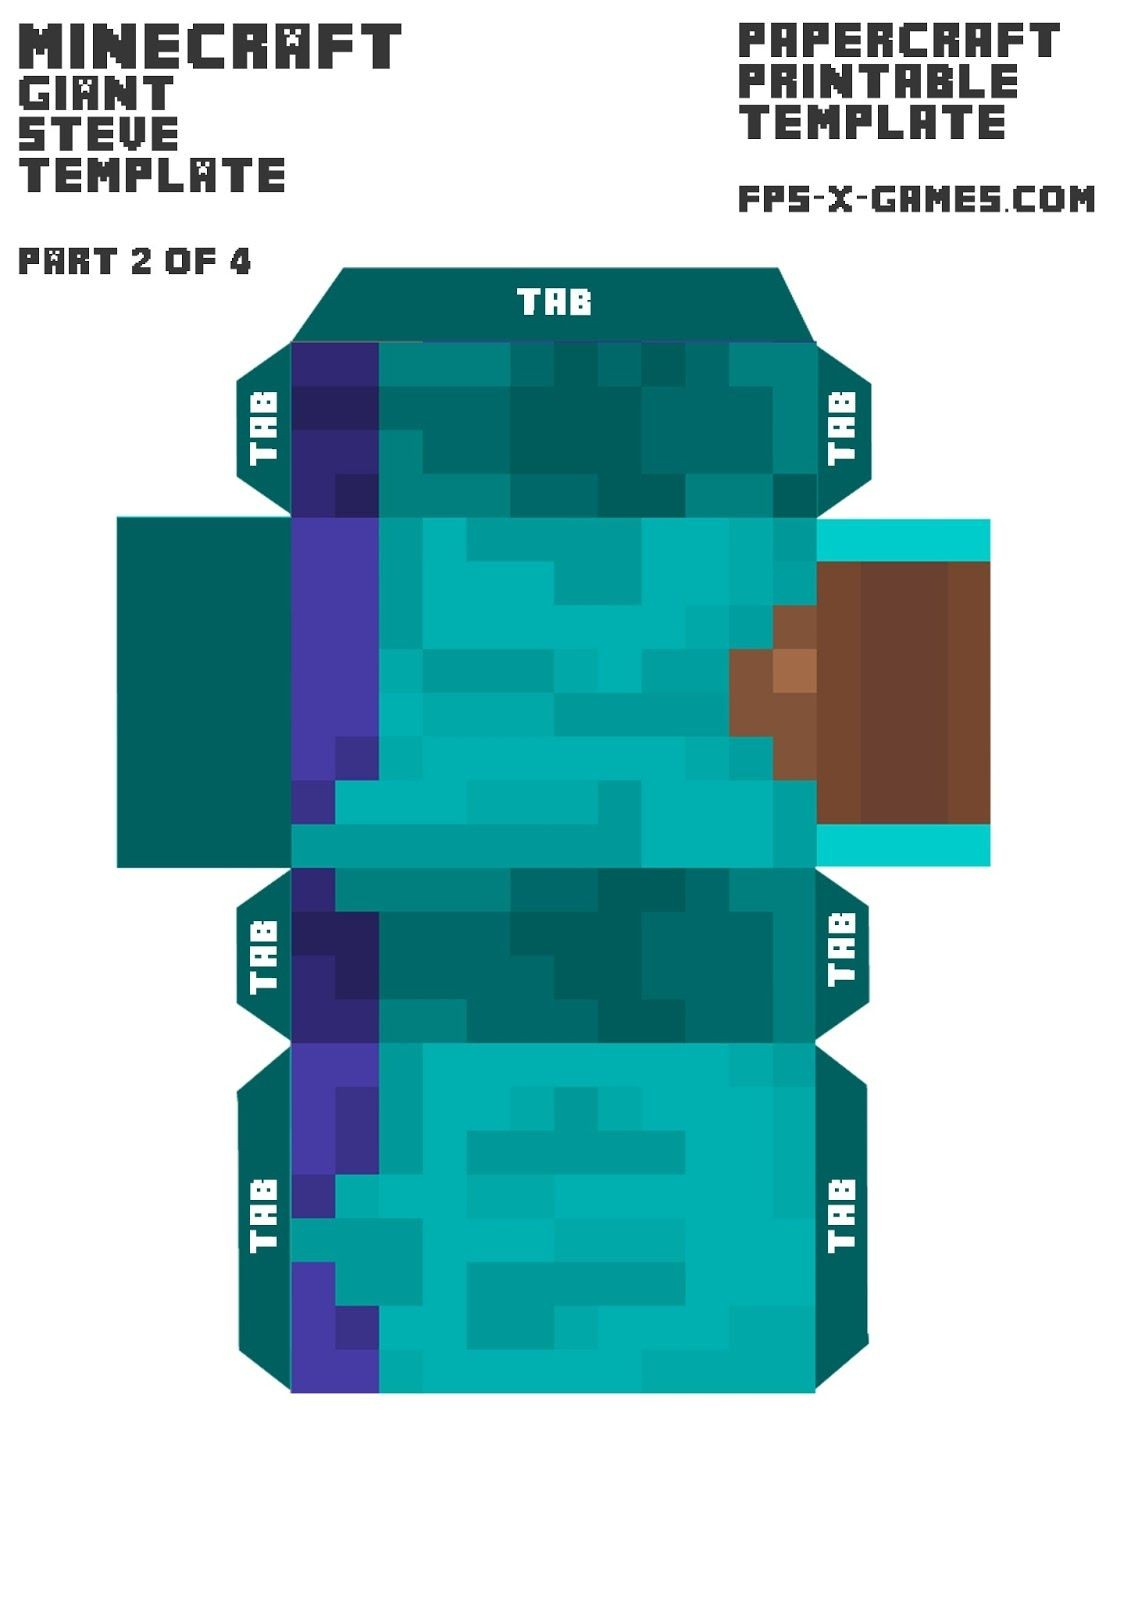 Steve Minecraft Papercraft Minecraft Giant Steve Arms Template 3 4